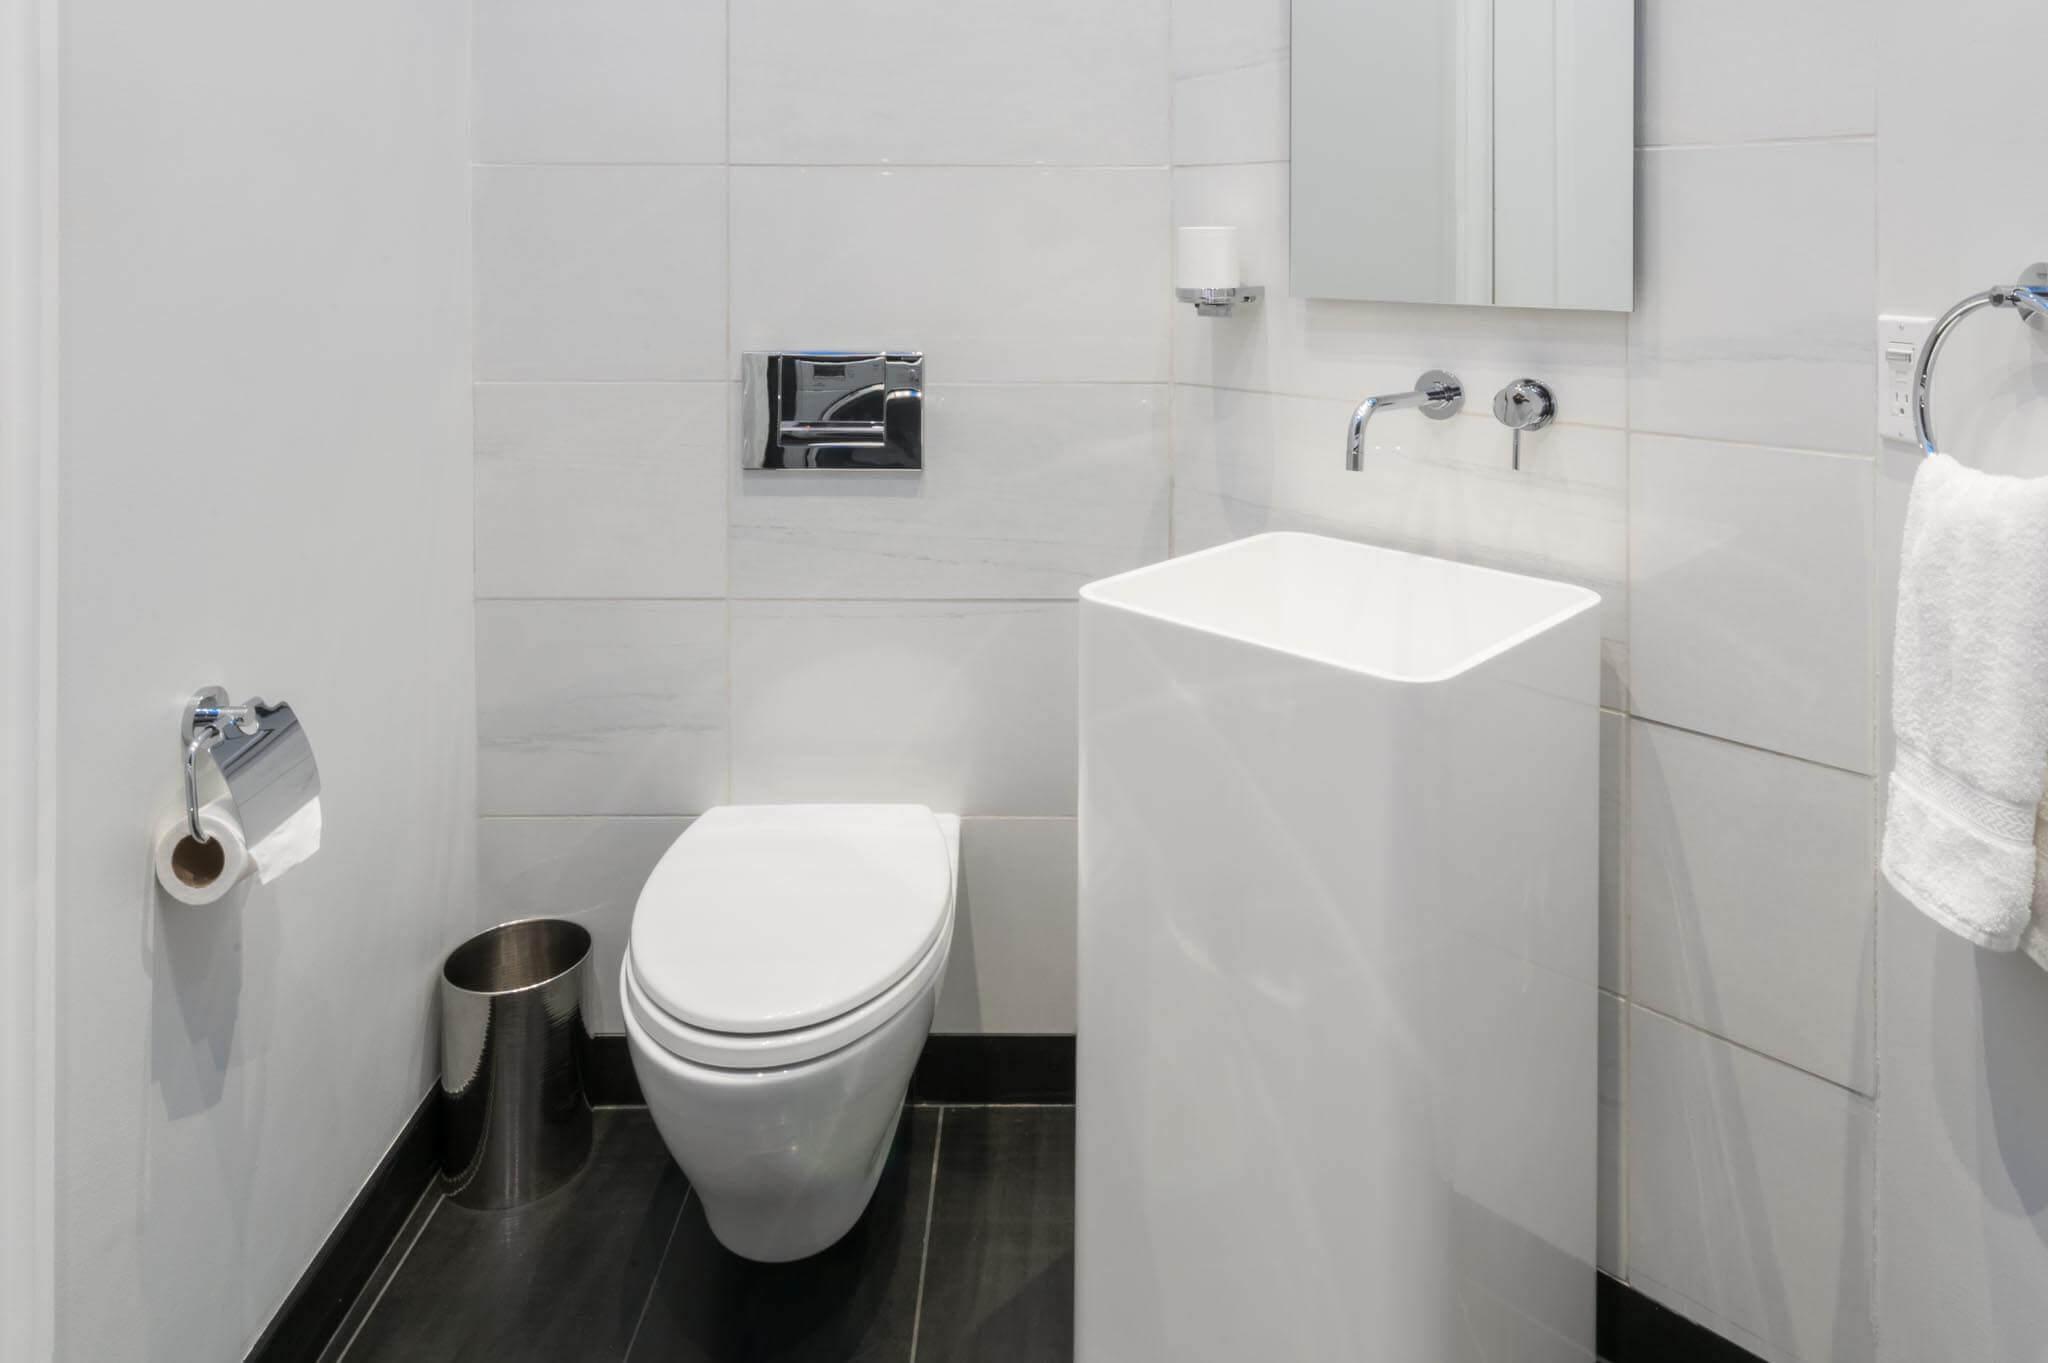 salle d'eau salle de bain